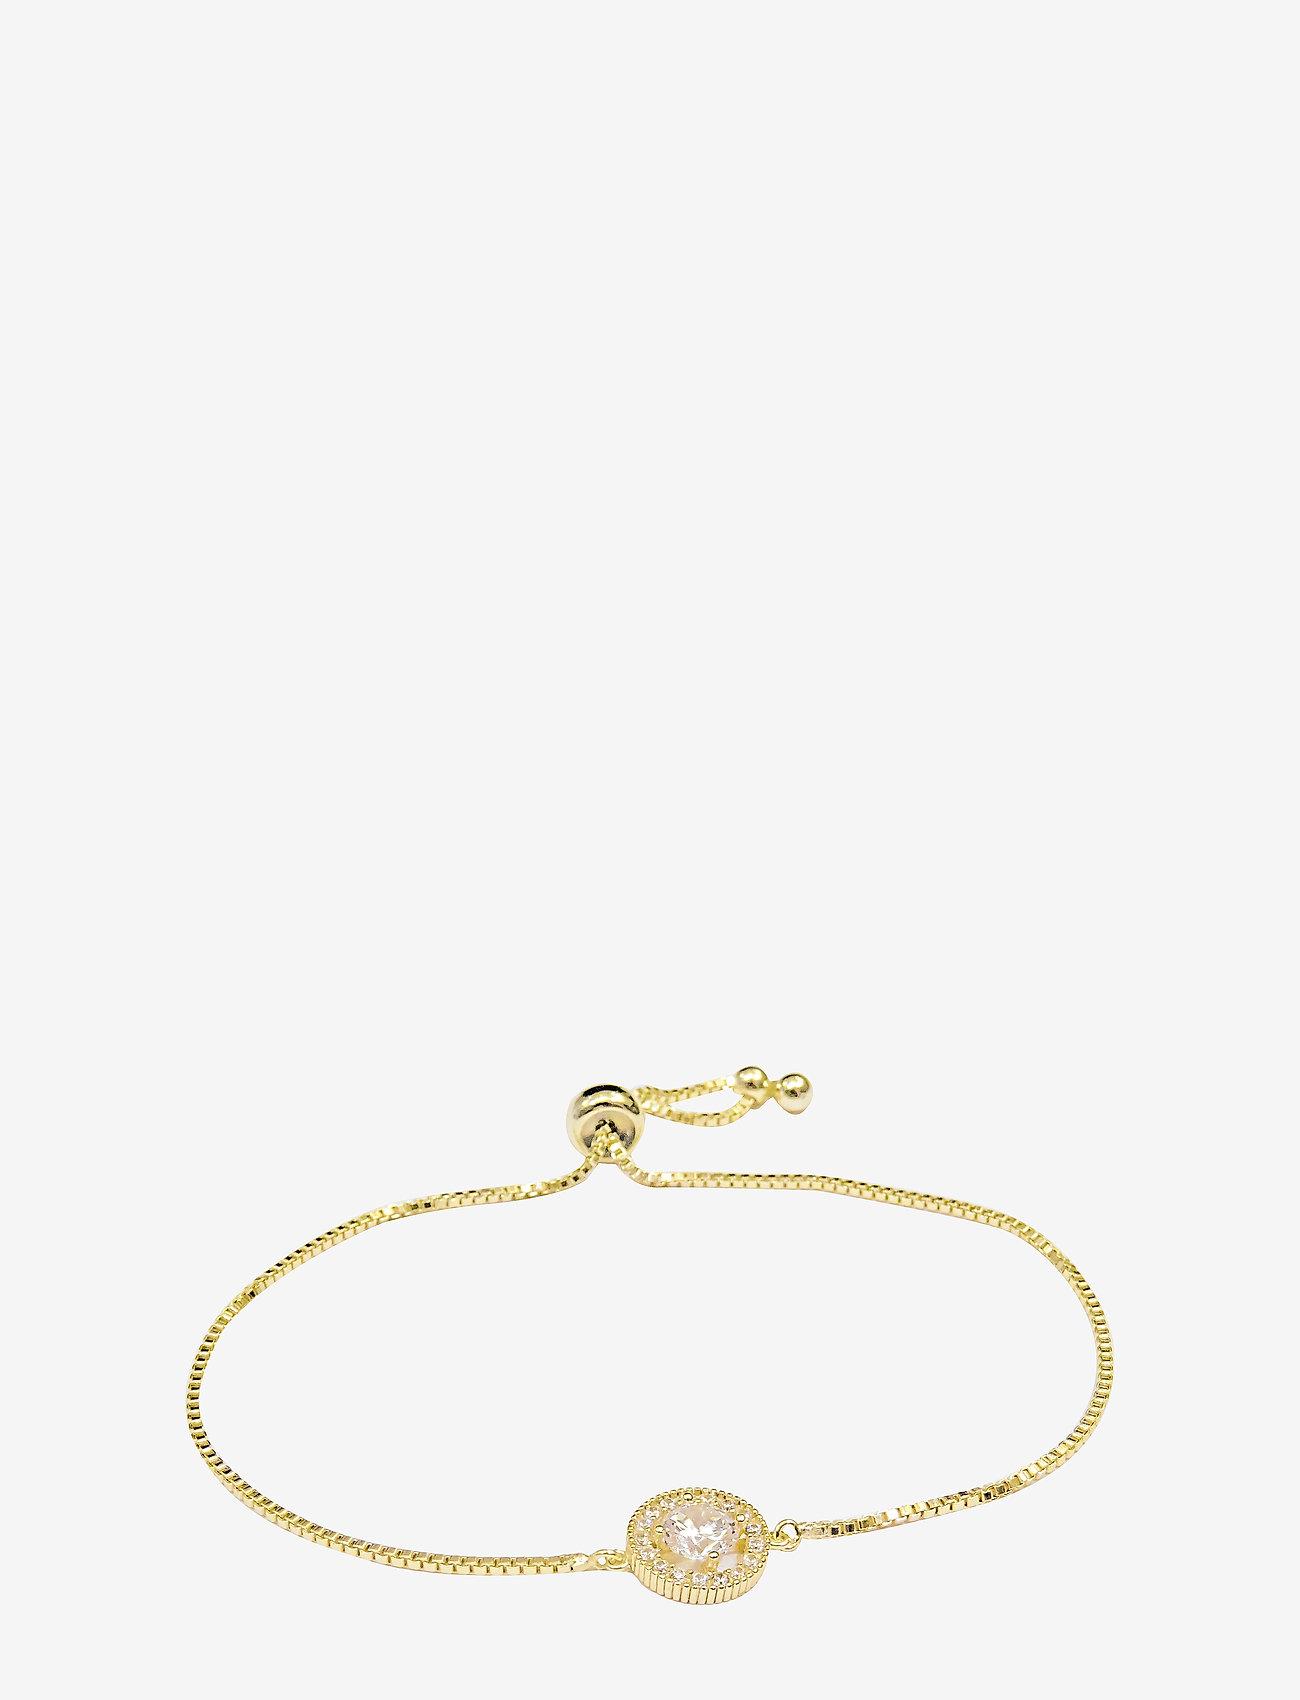 PIPOL'S BAZAAR - Estrade PIPOL Bracelet Golden Clear - dainty - gold